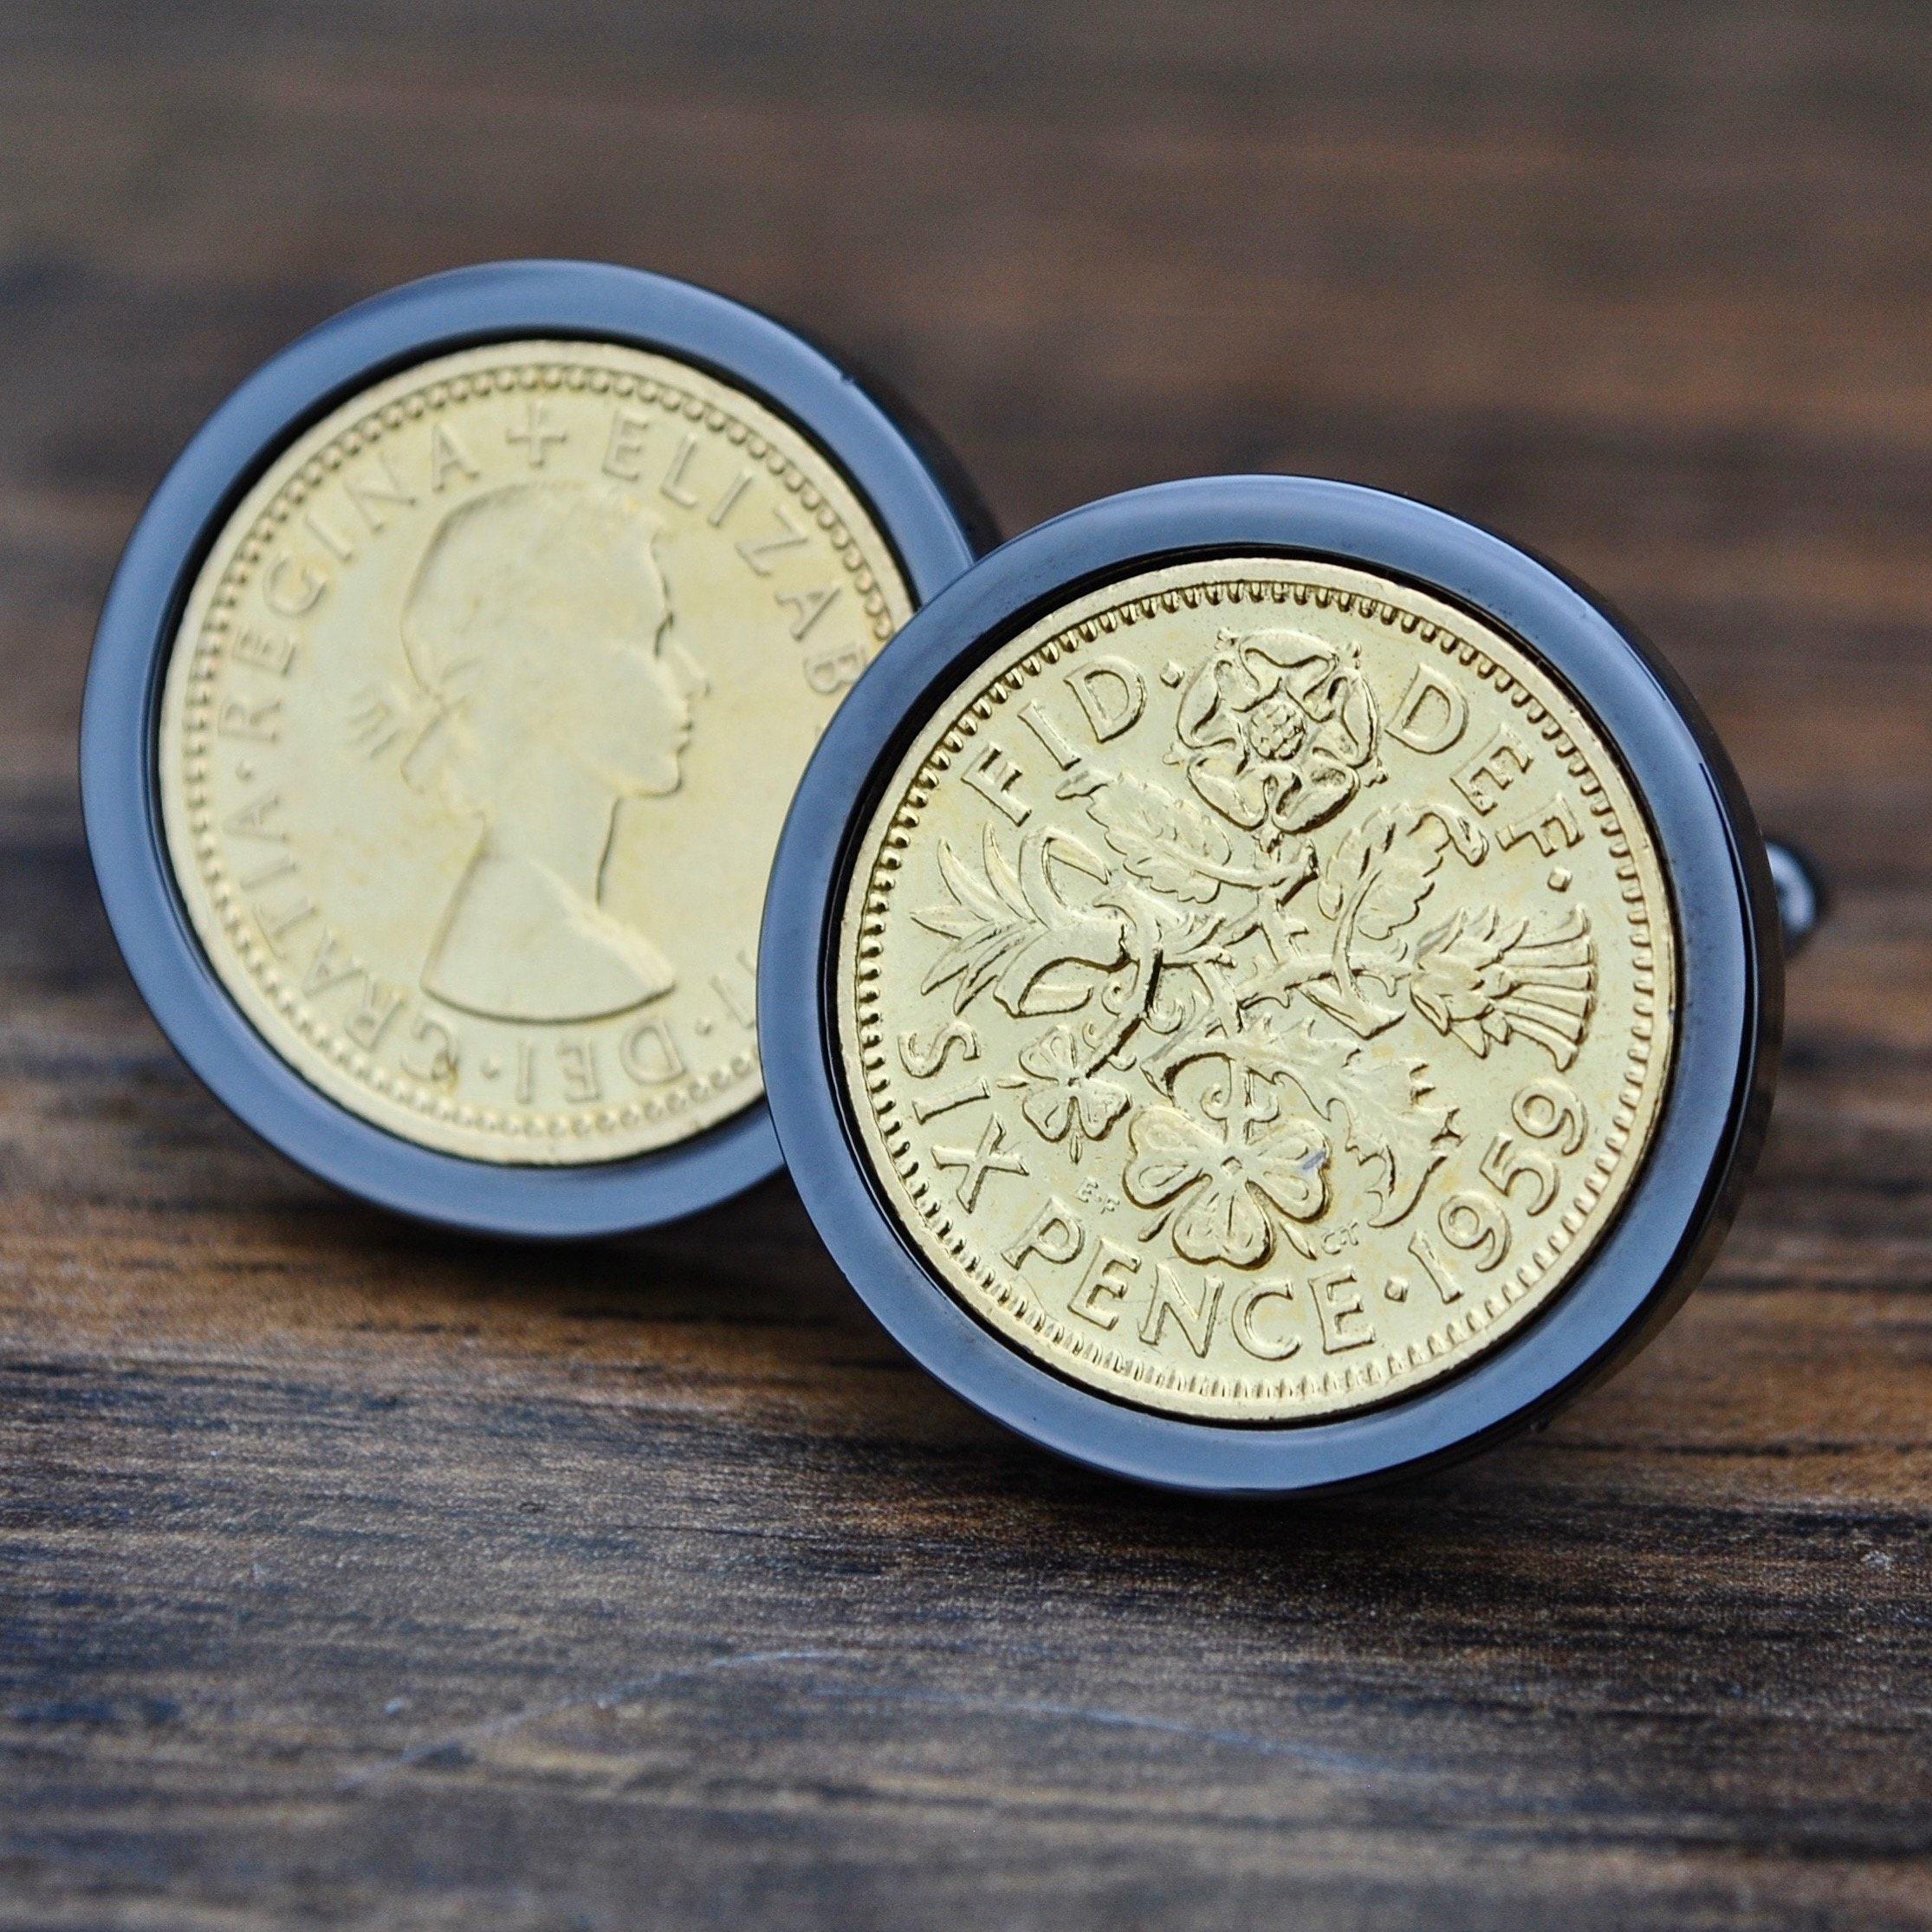 1959 60th Birthday Ideas 24k Gold Coin Cufflinks Born In Mens Gift Him Dad Son Anniversary